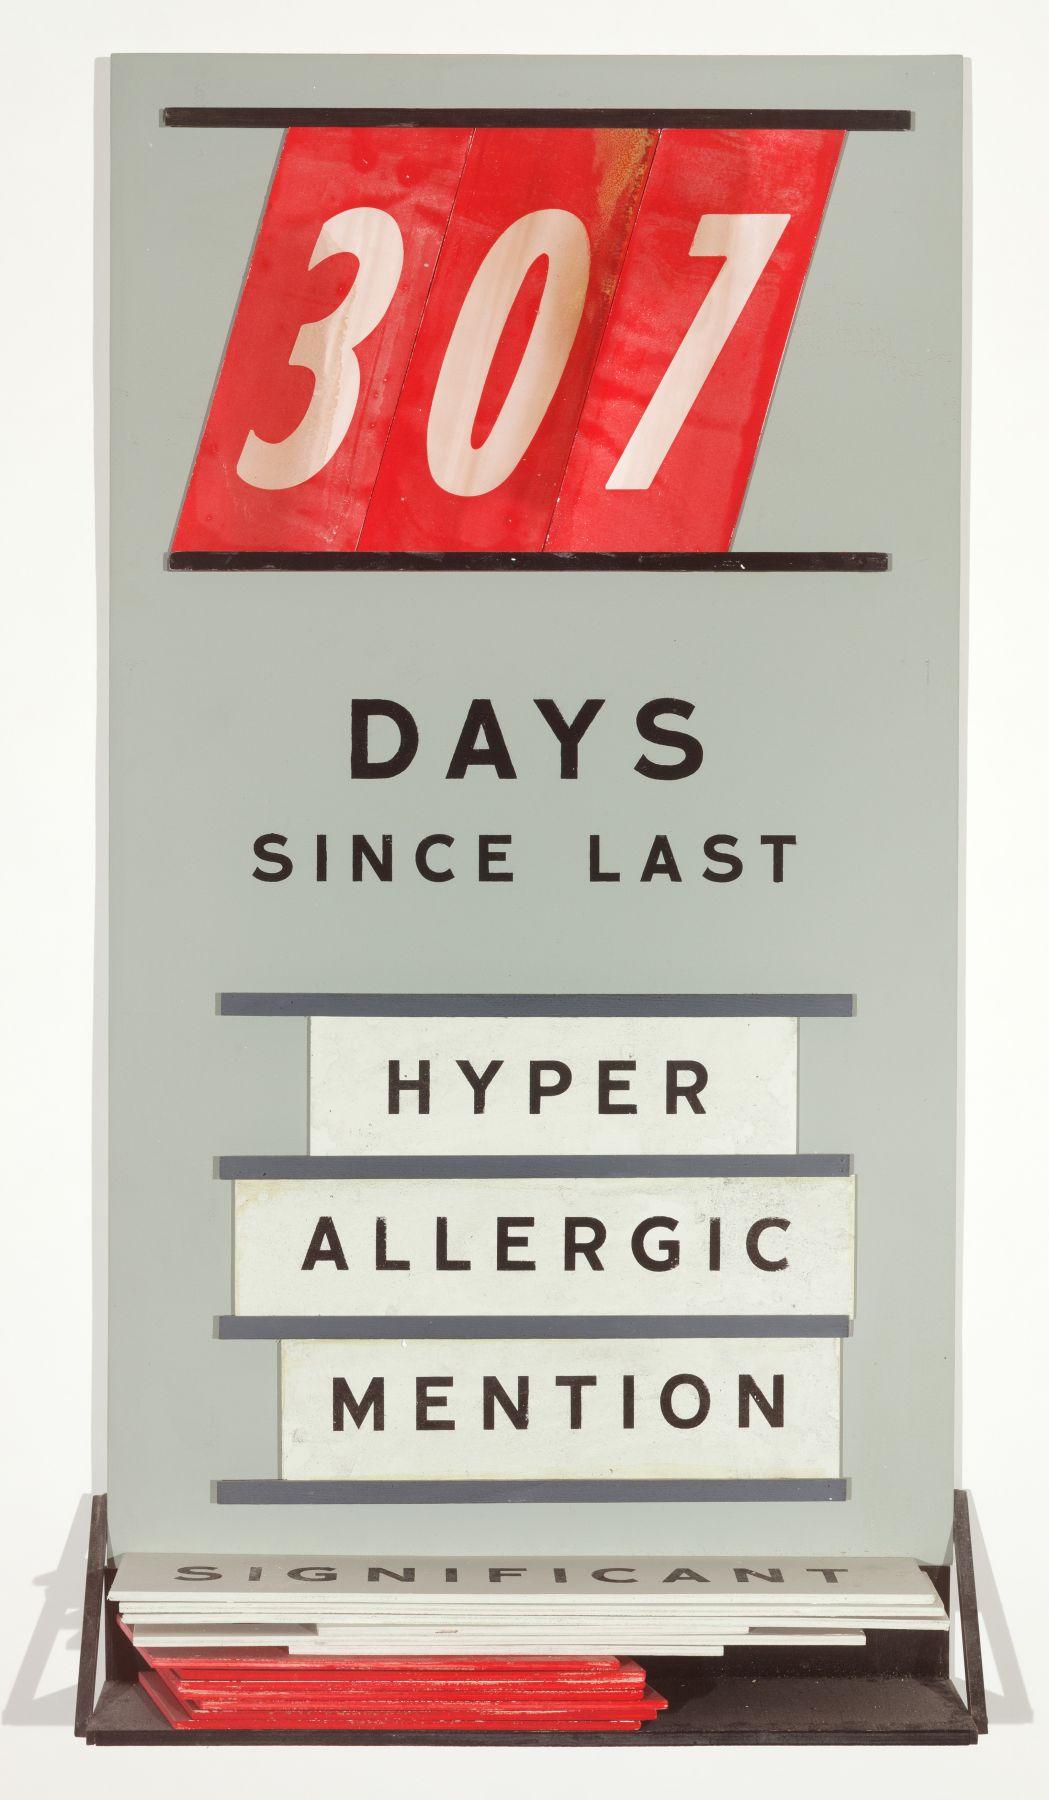 SKYLAR FEIN, Days Since Last Hyperallergic Mention, 2019